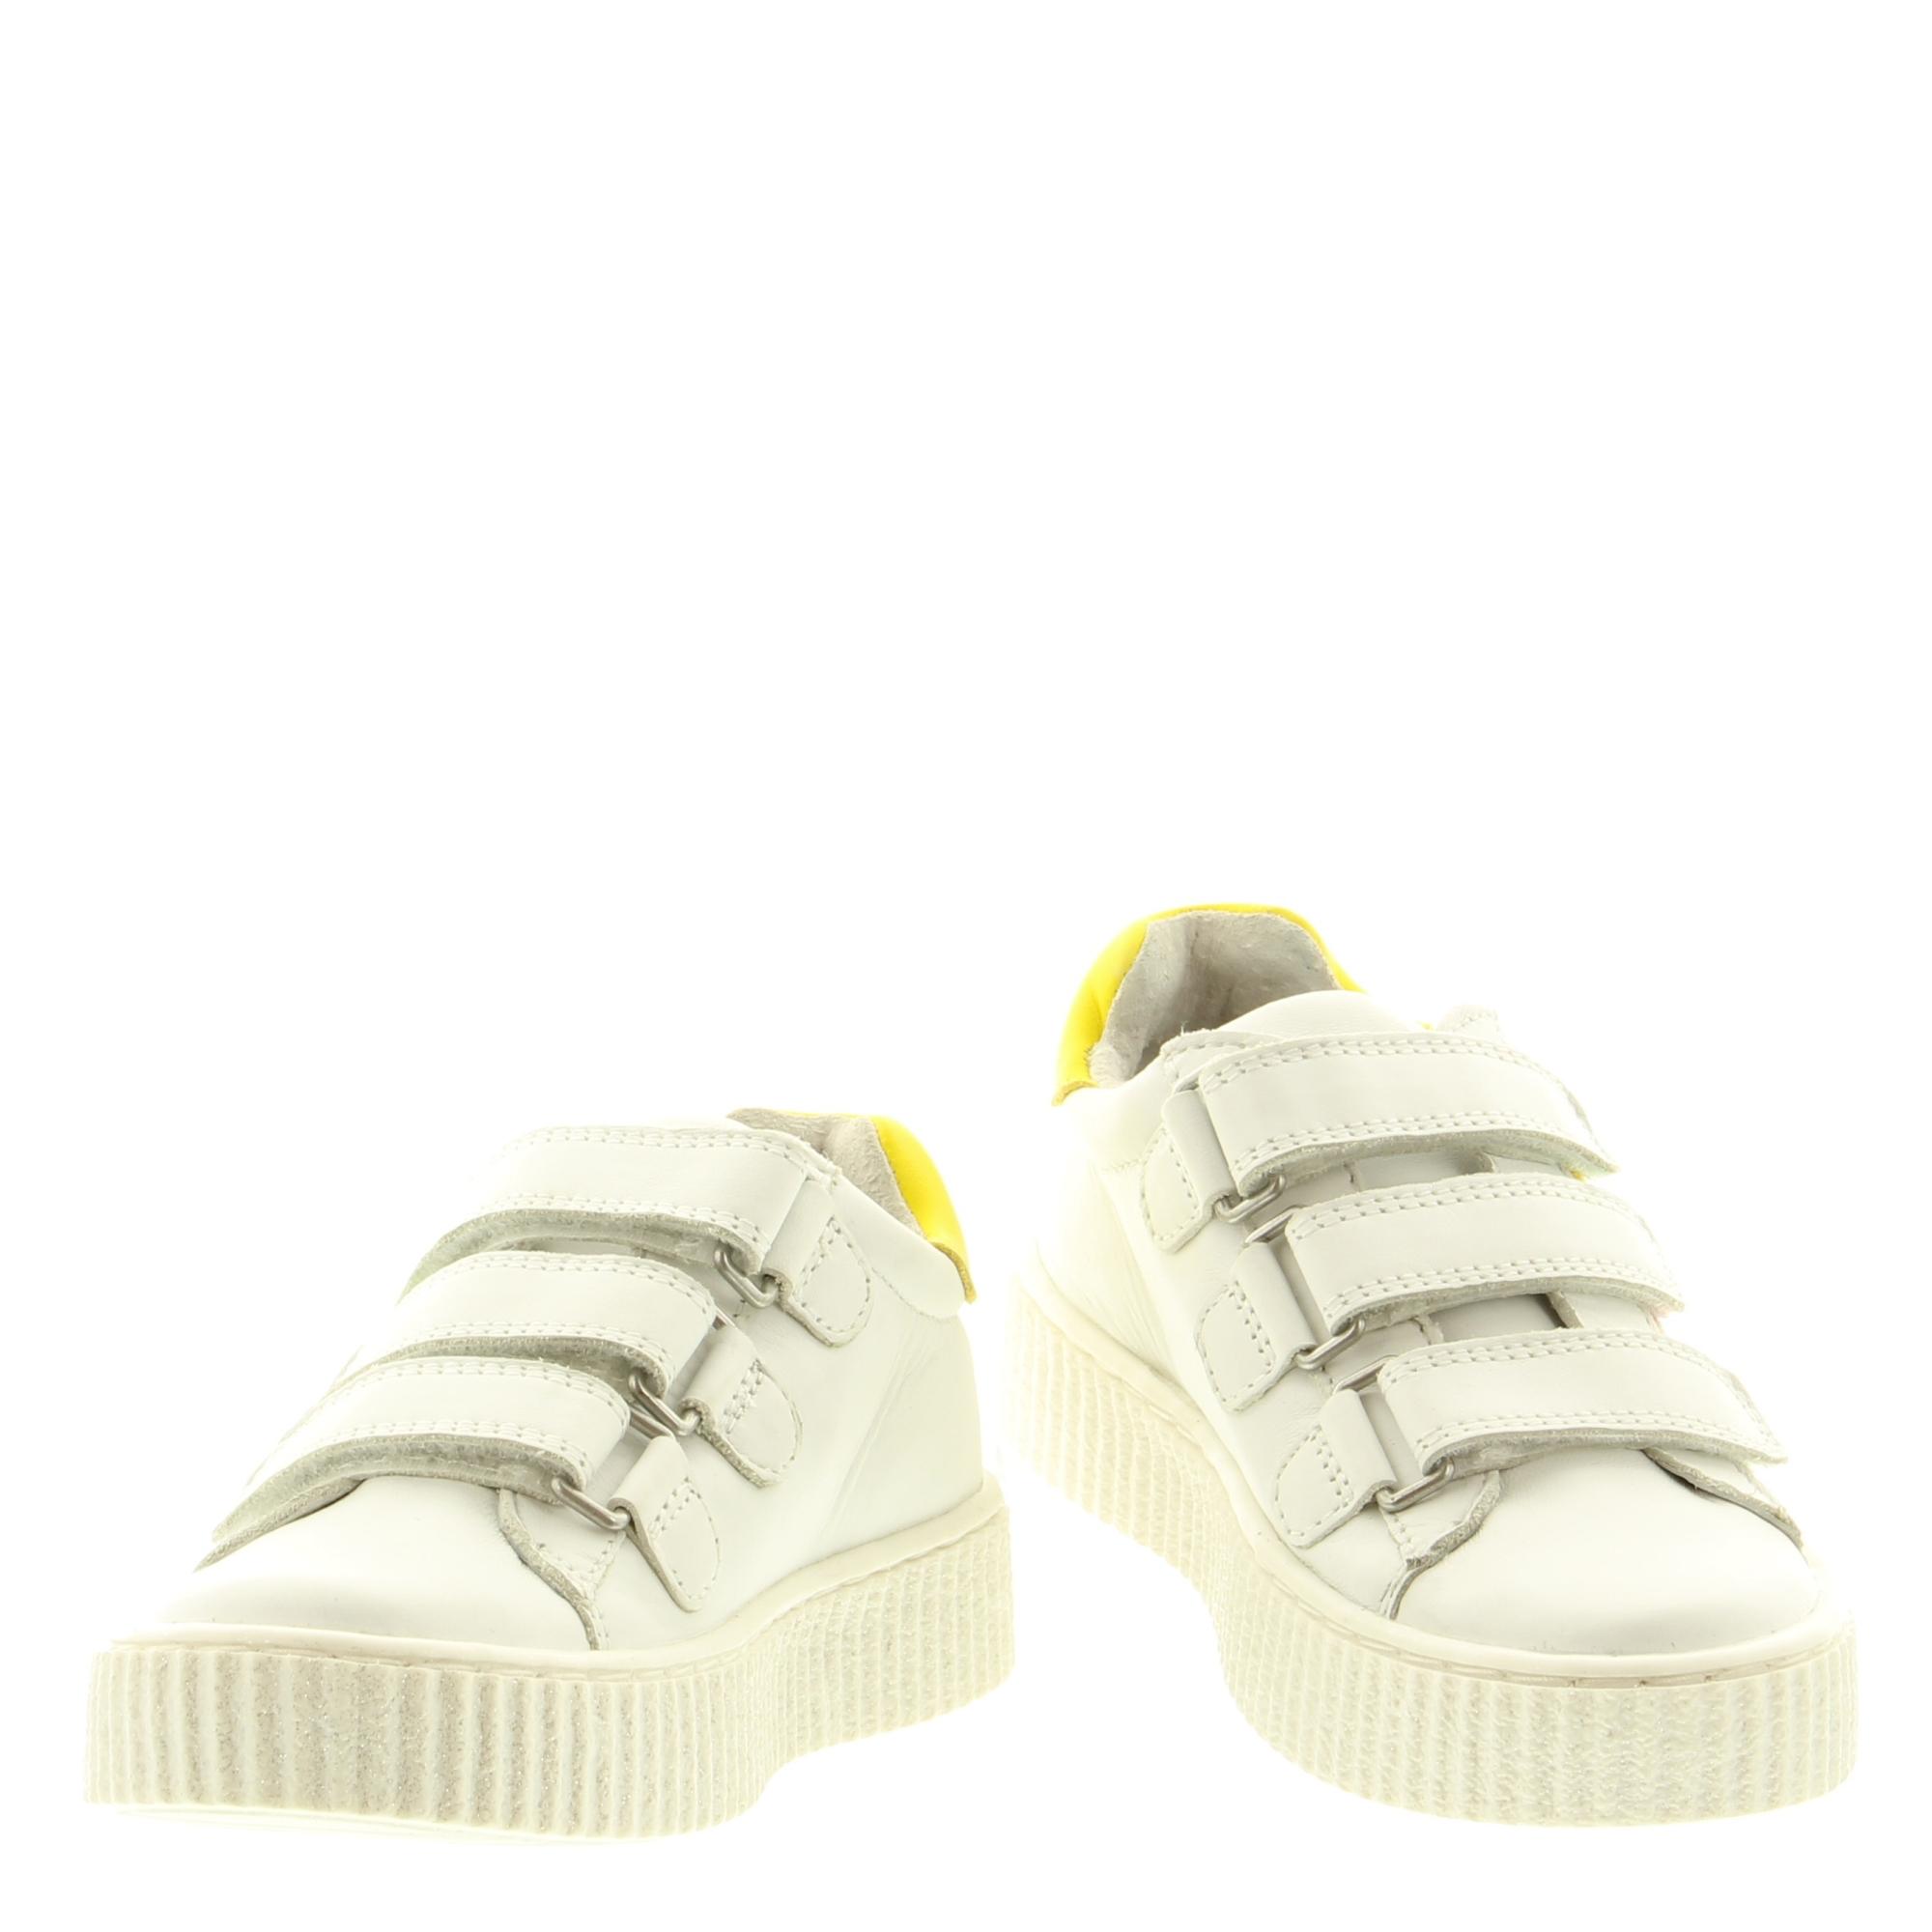 Twins Trackstyle 320126 500 White Yellow